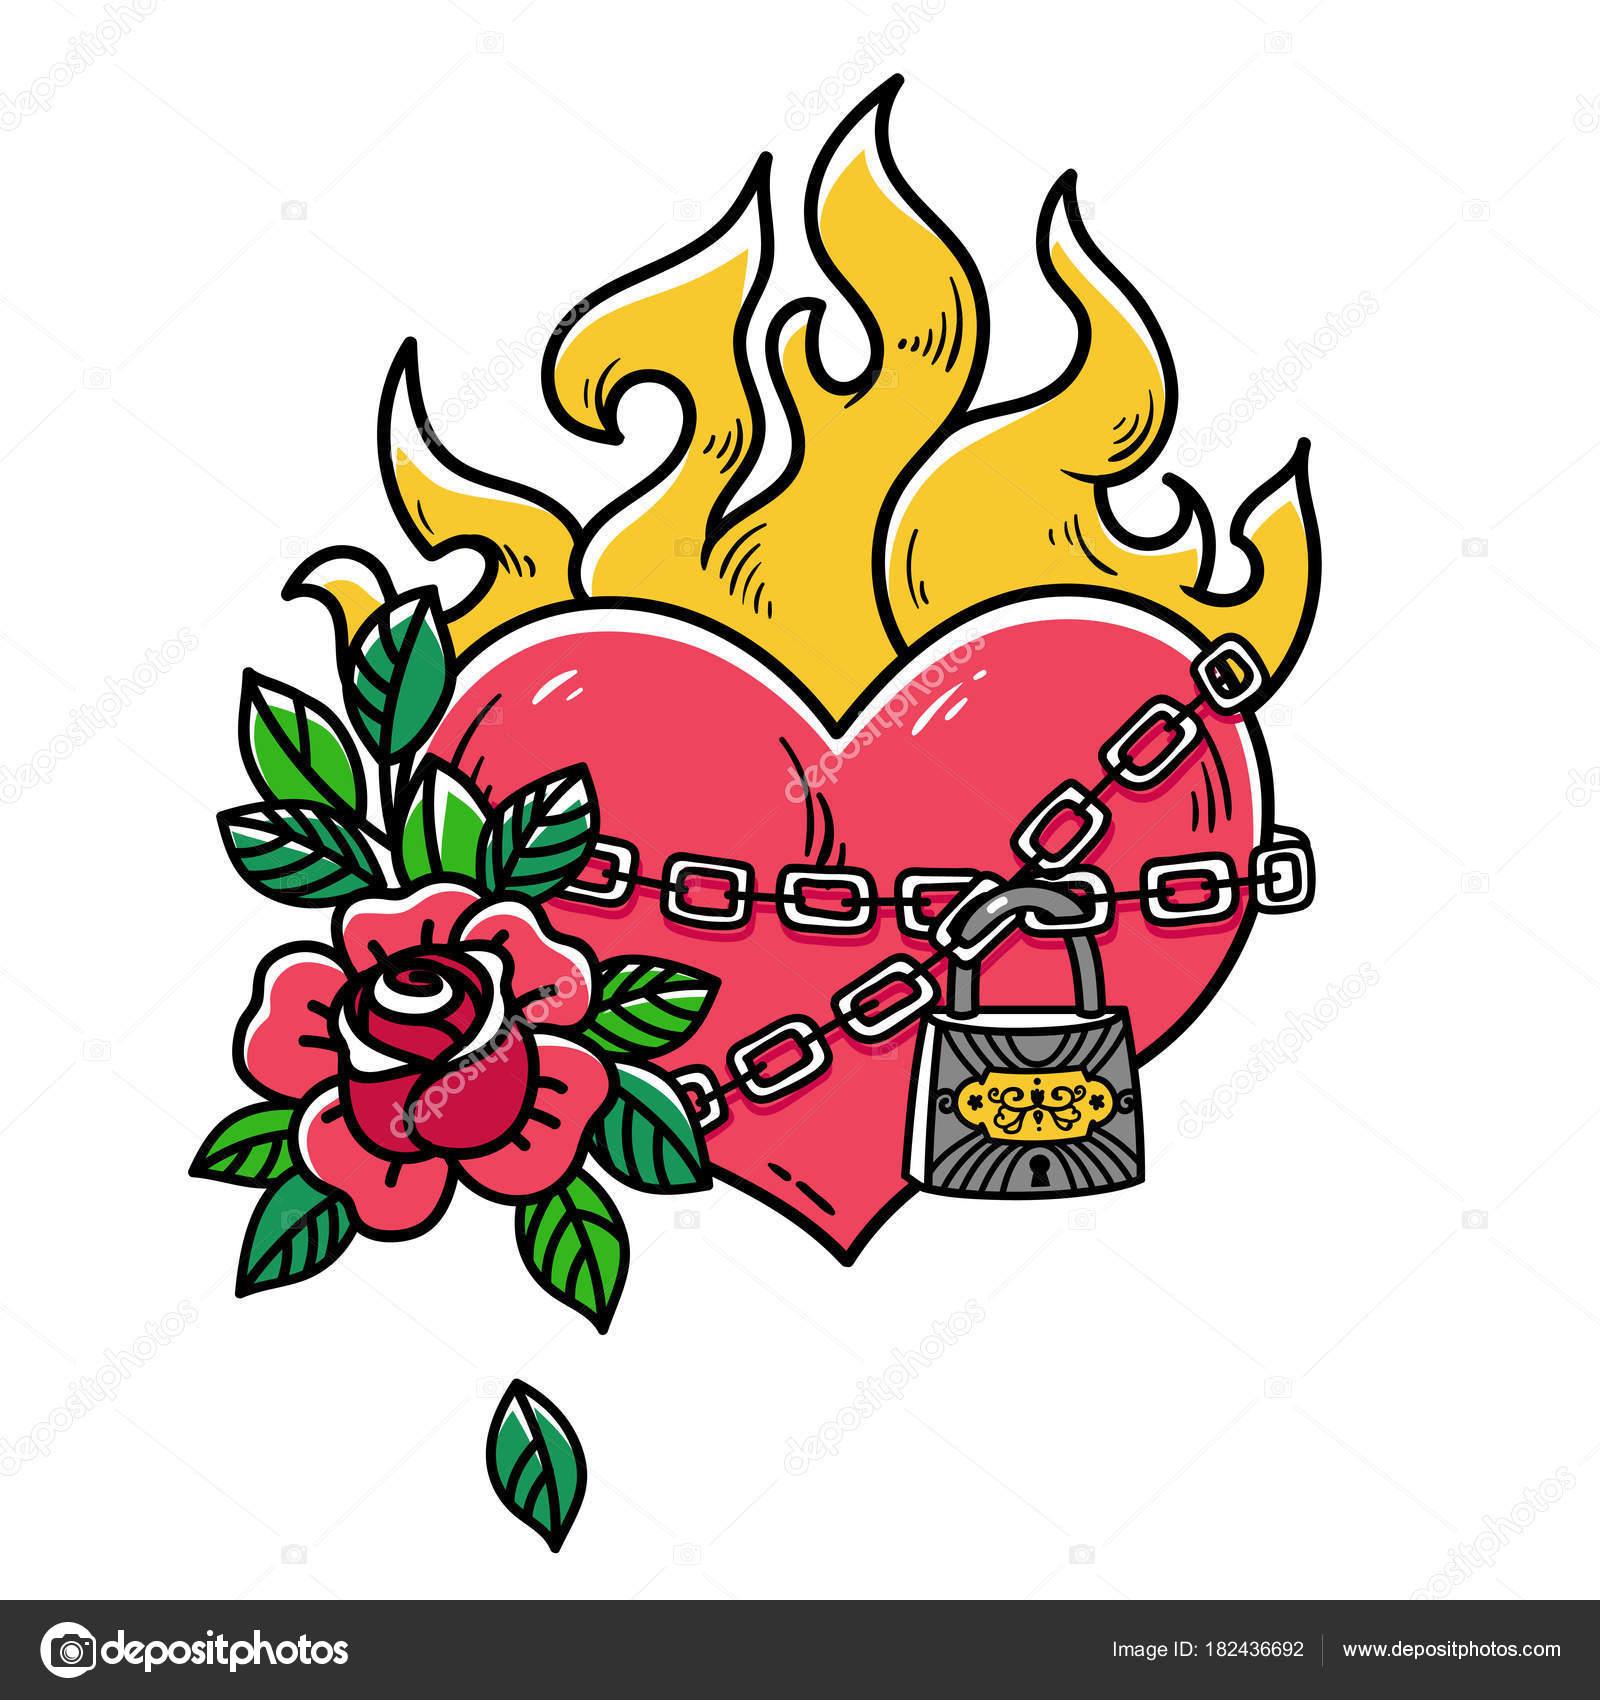 Tatuaje corazón llameante atado con cadenas de amor. Corazón con ...